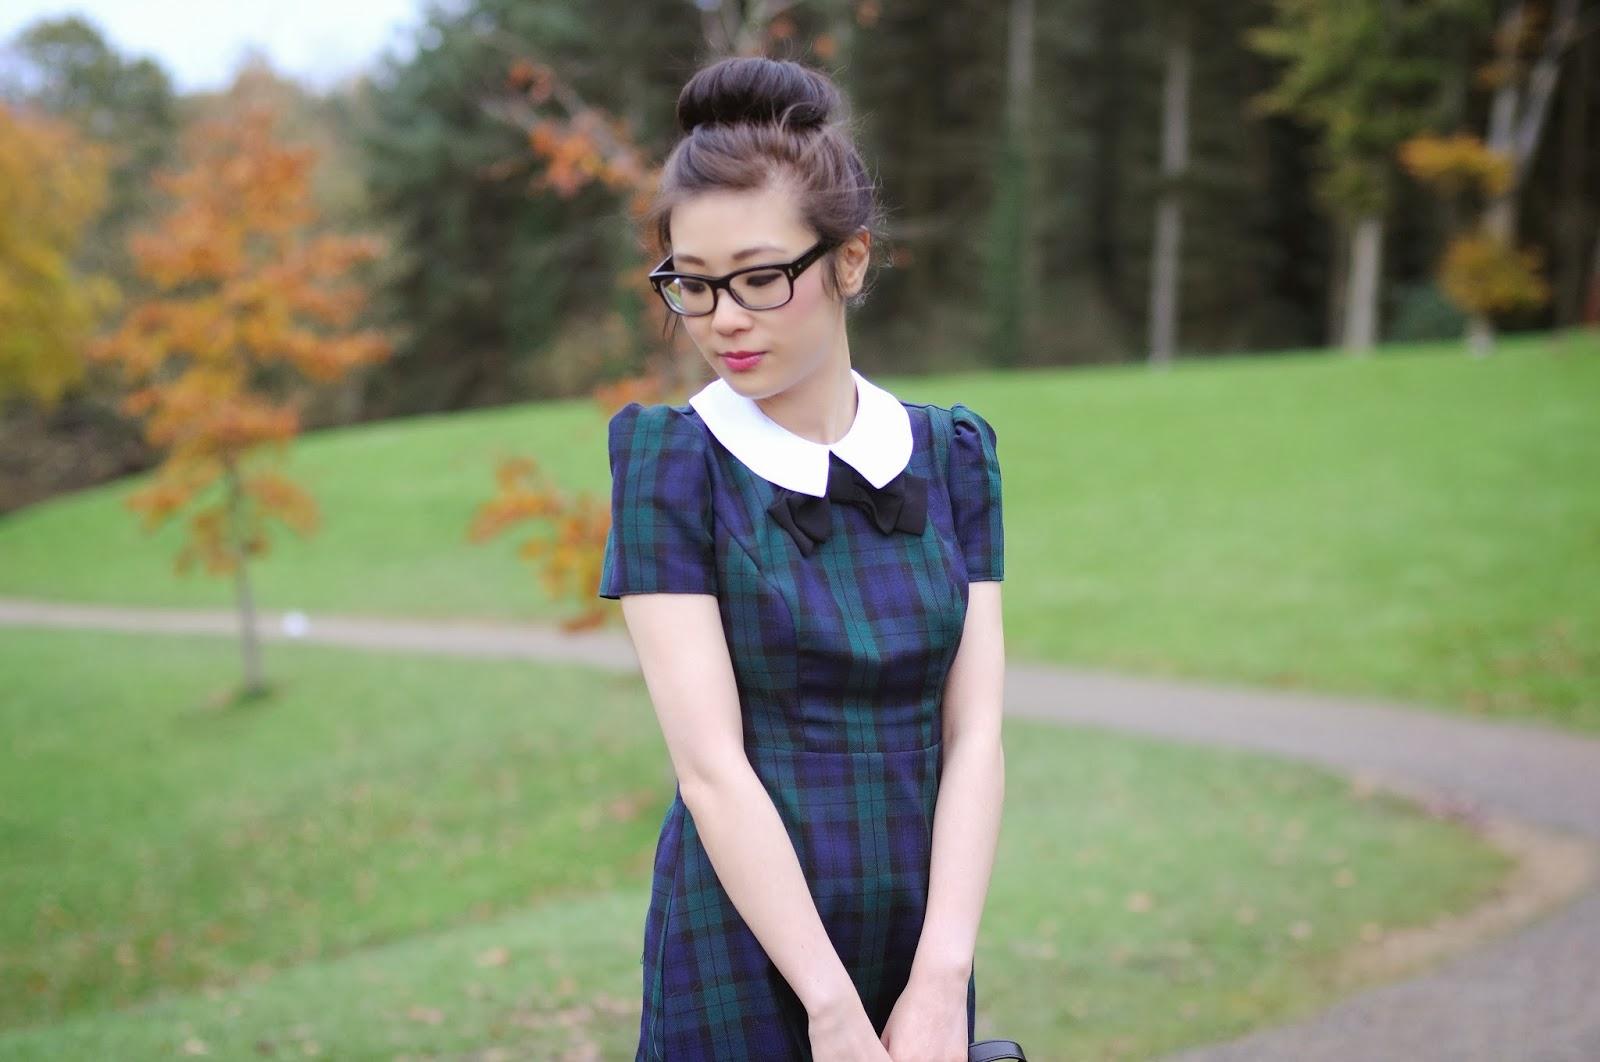 Ways to style a tartan dress, how to wear a tartan dress